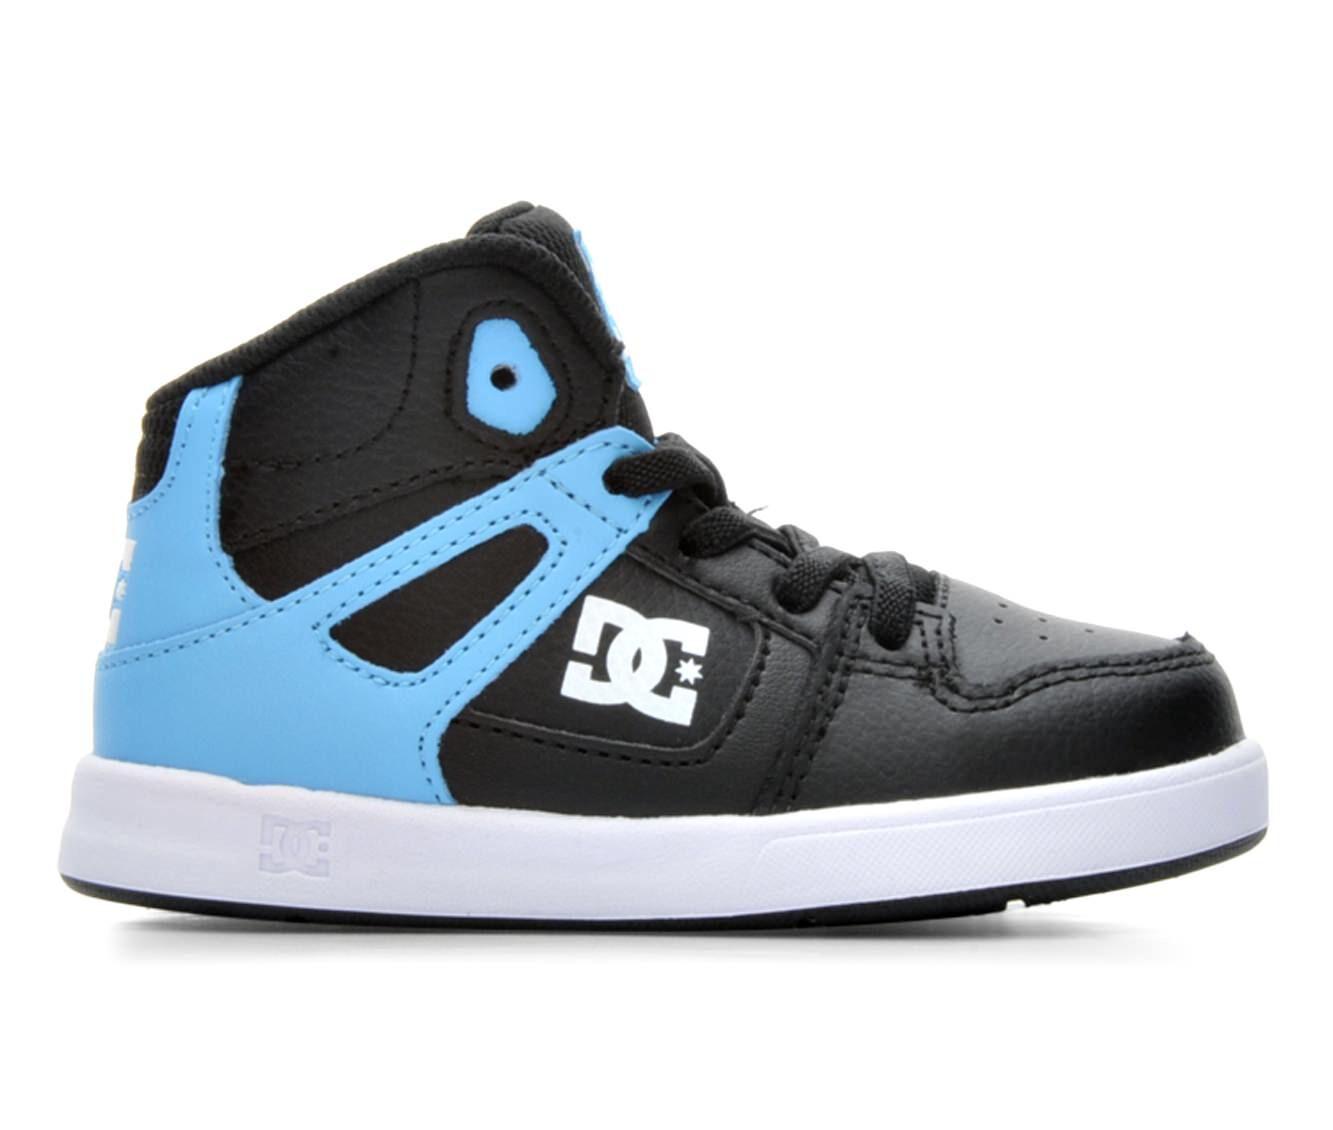 Boys DC Infant Rebound UL Boys 510 Skate Shoes